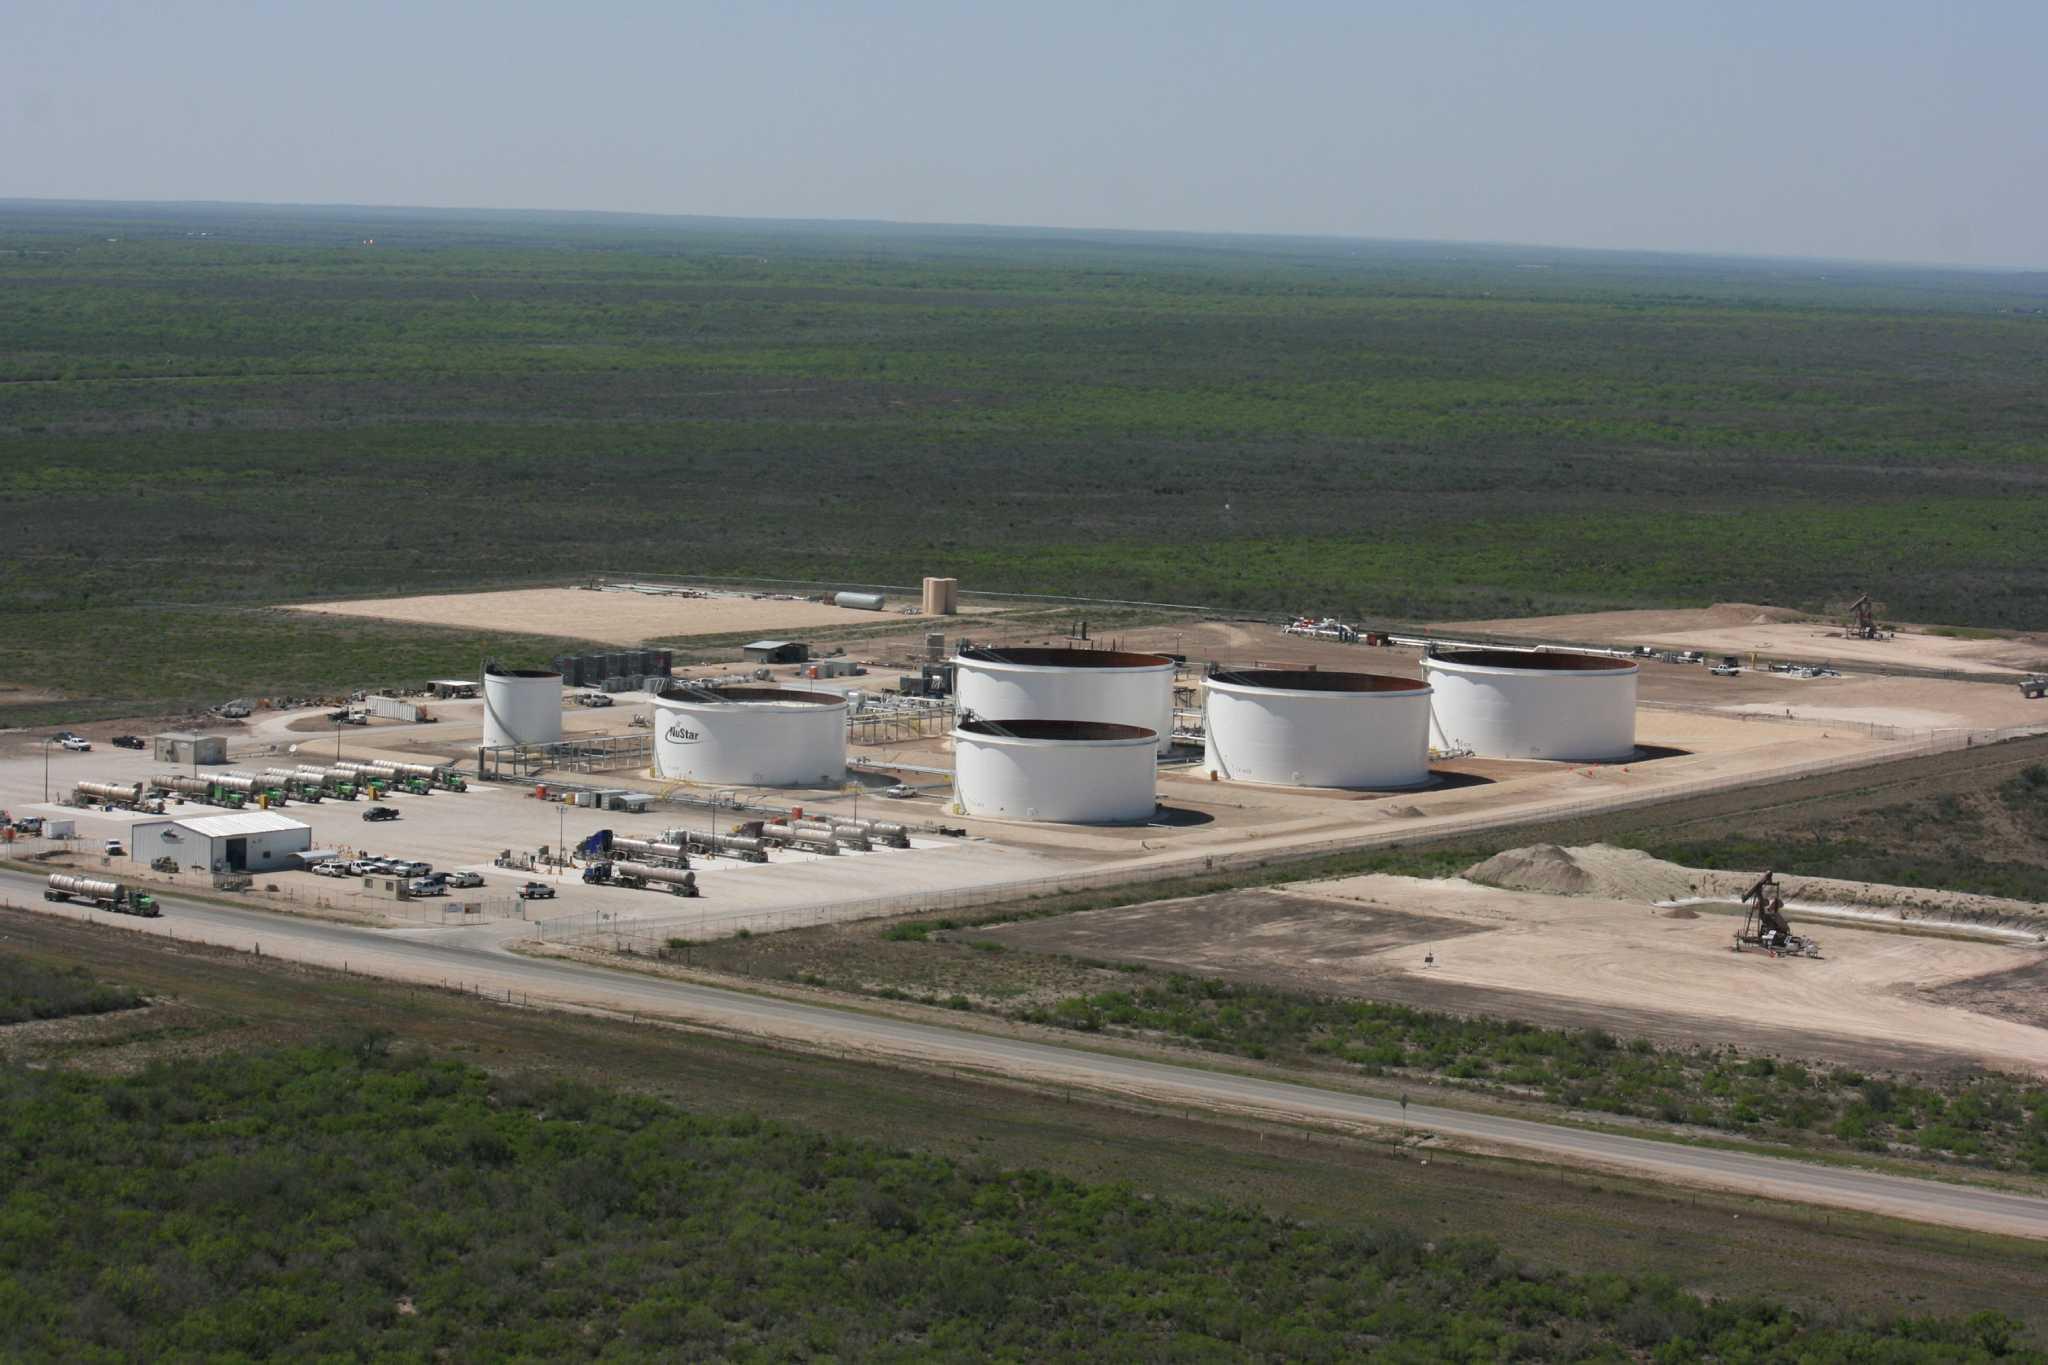 Nustar Energy S Net Income Rises San Antonio Express News